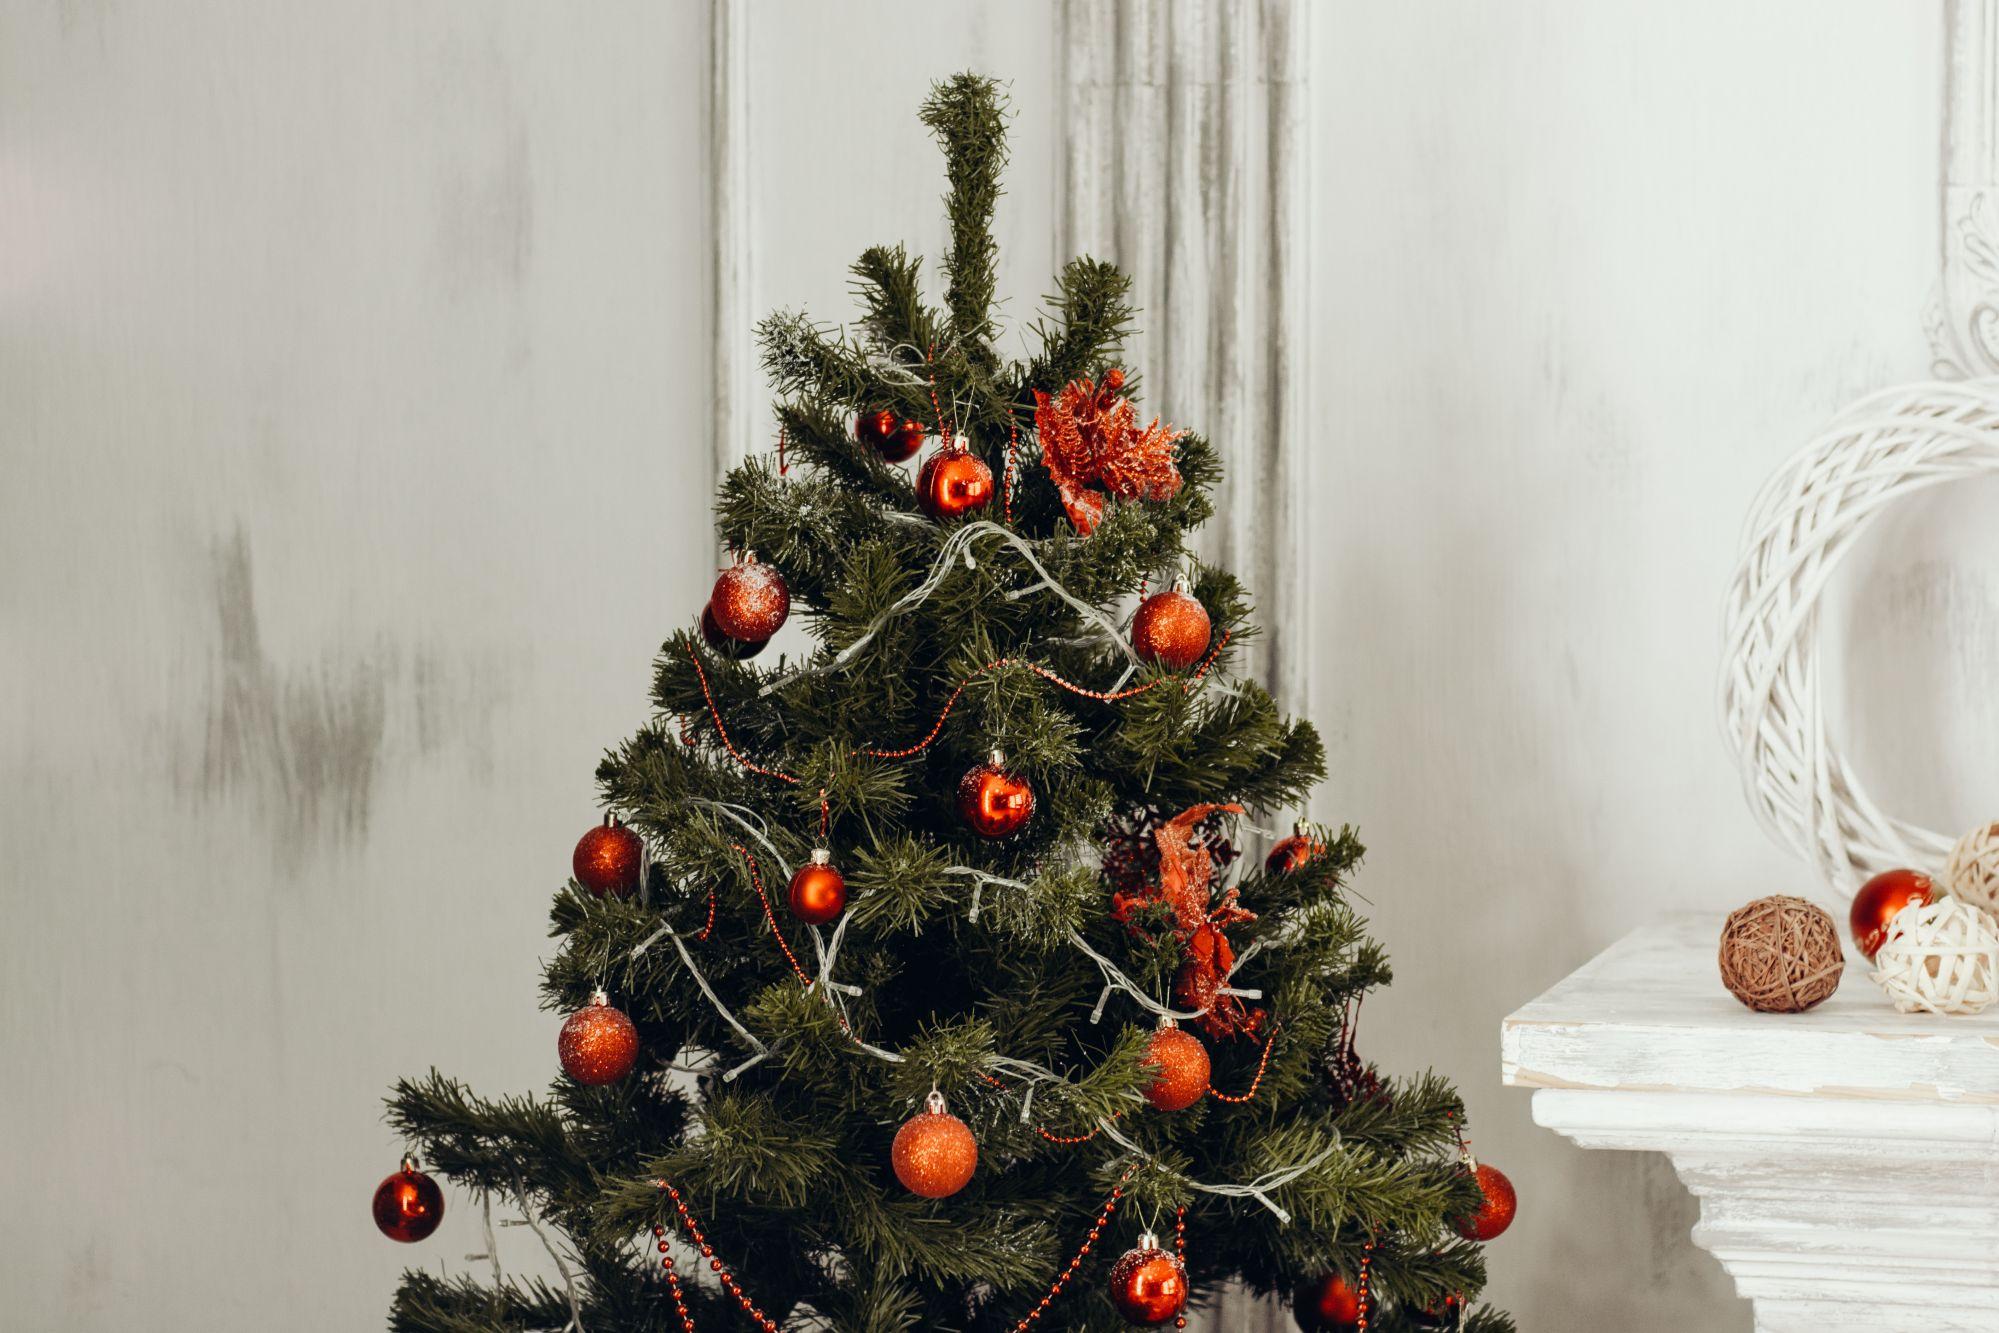 Rustic Christmas Coronavirus Covid 19 2020 Pandemic First Pandemic Ornament Wood Log Christmas Decor Quarantine